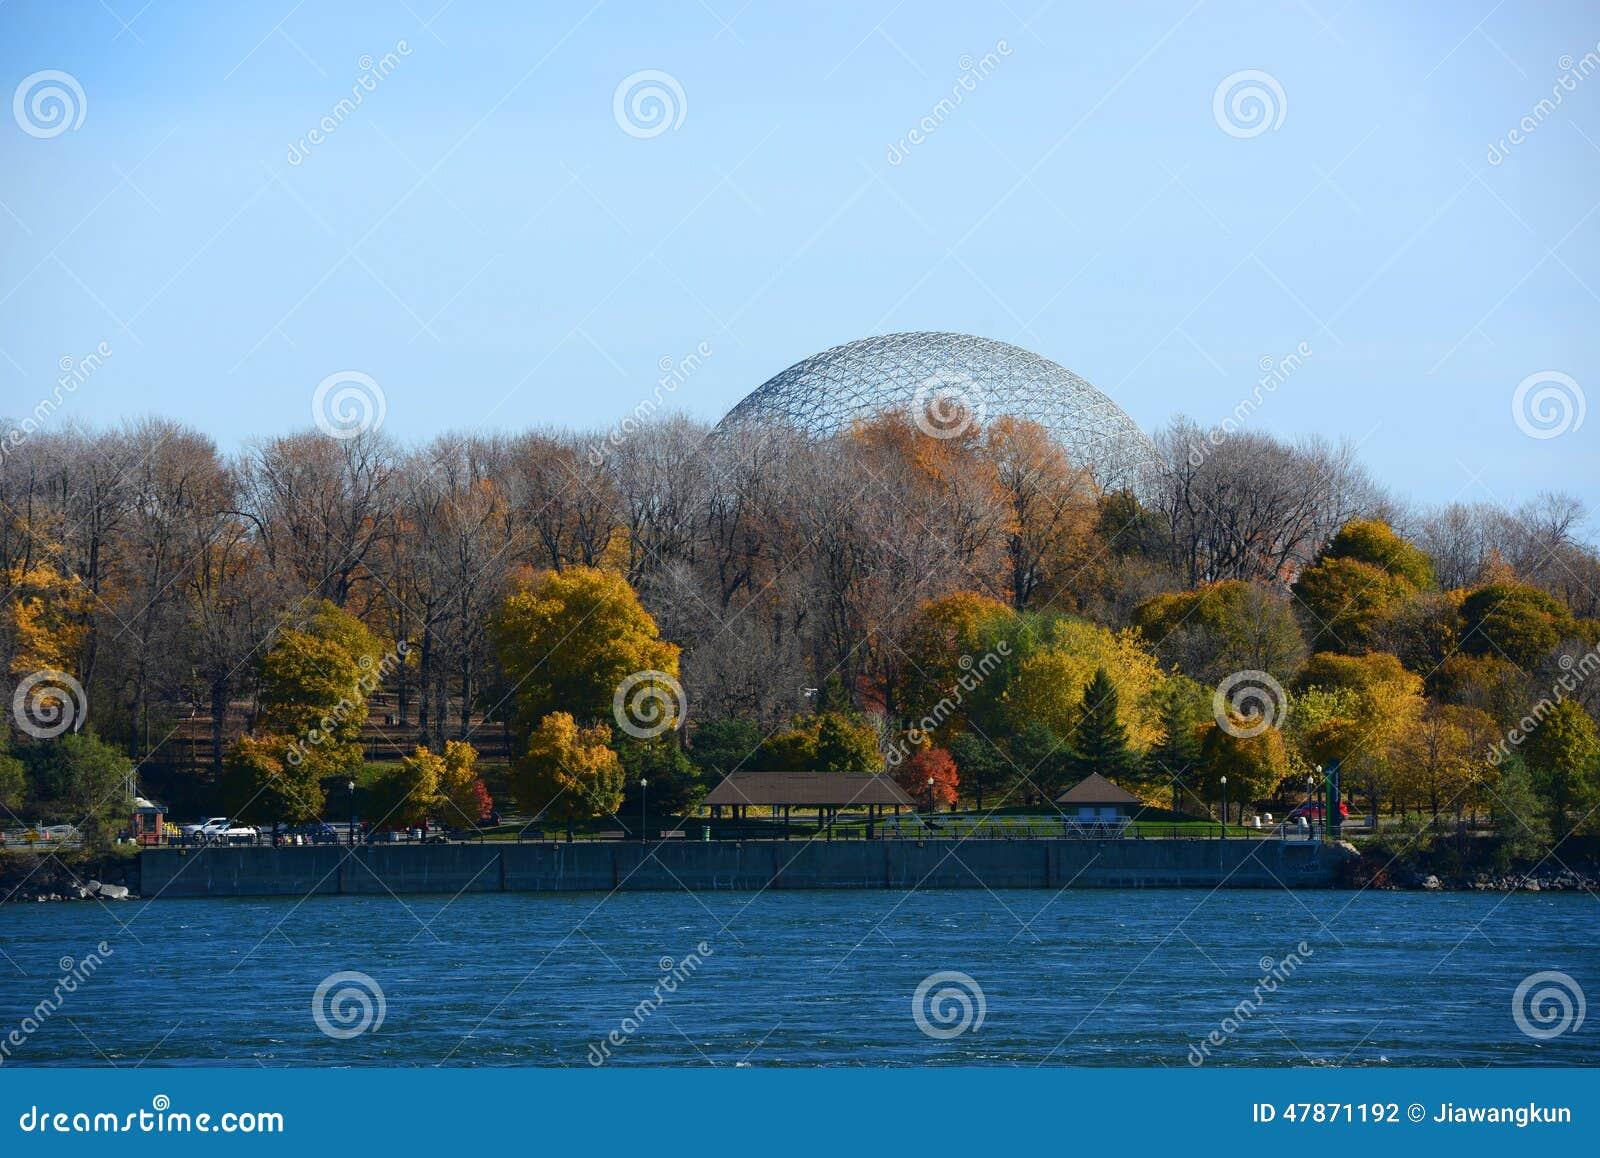 Biosfera di Montreal a Montreal, Quebec, Canada